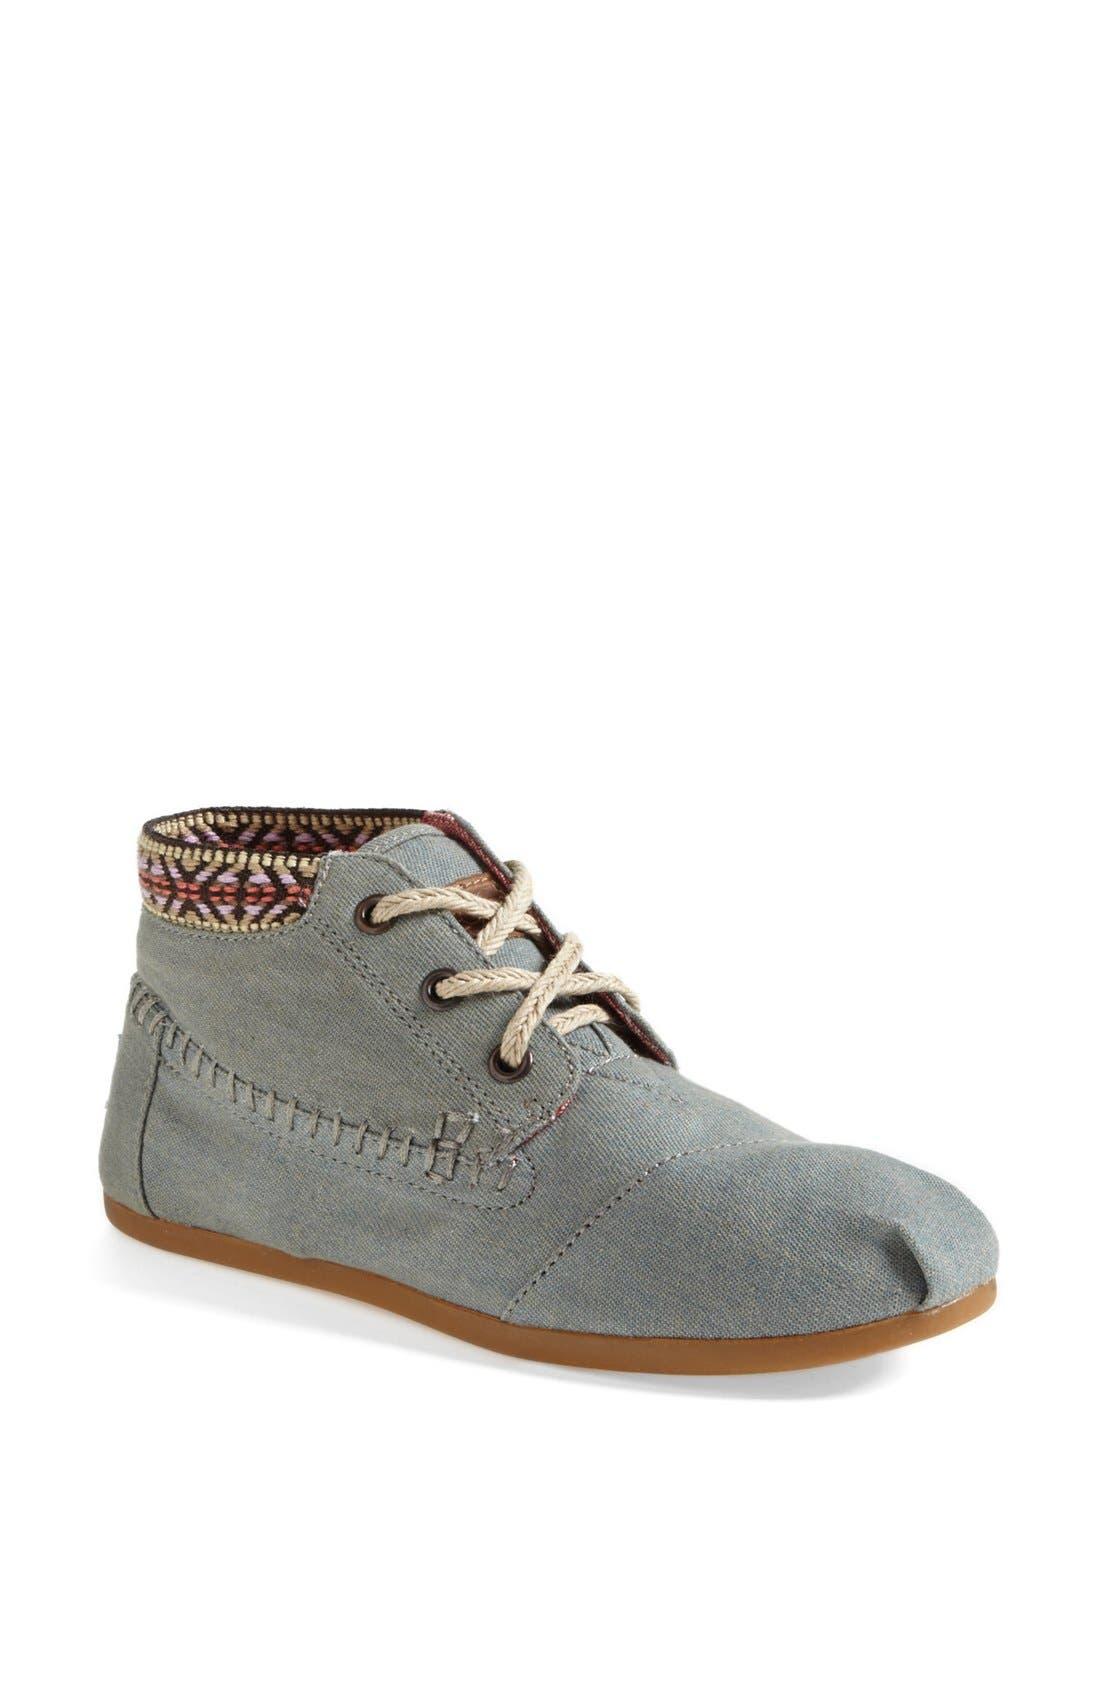 Main Image - TOMS 'Desert' Burlap & Cotton Boot (Women)